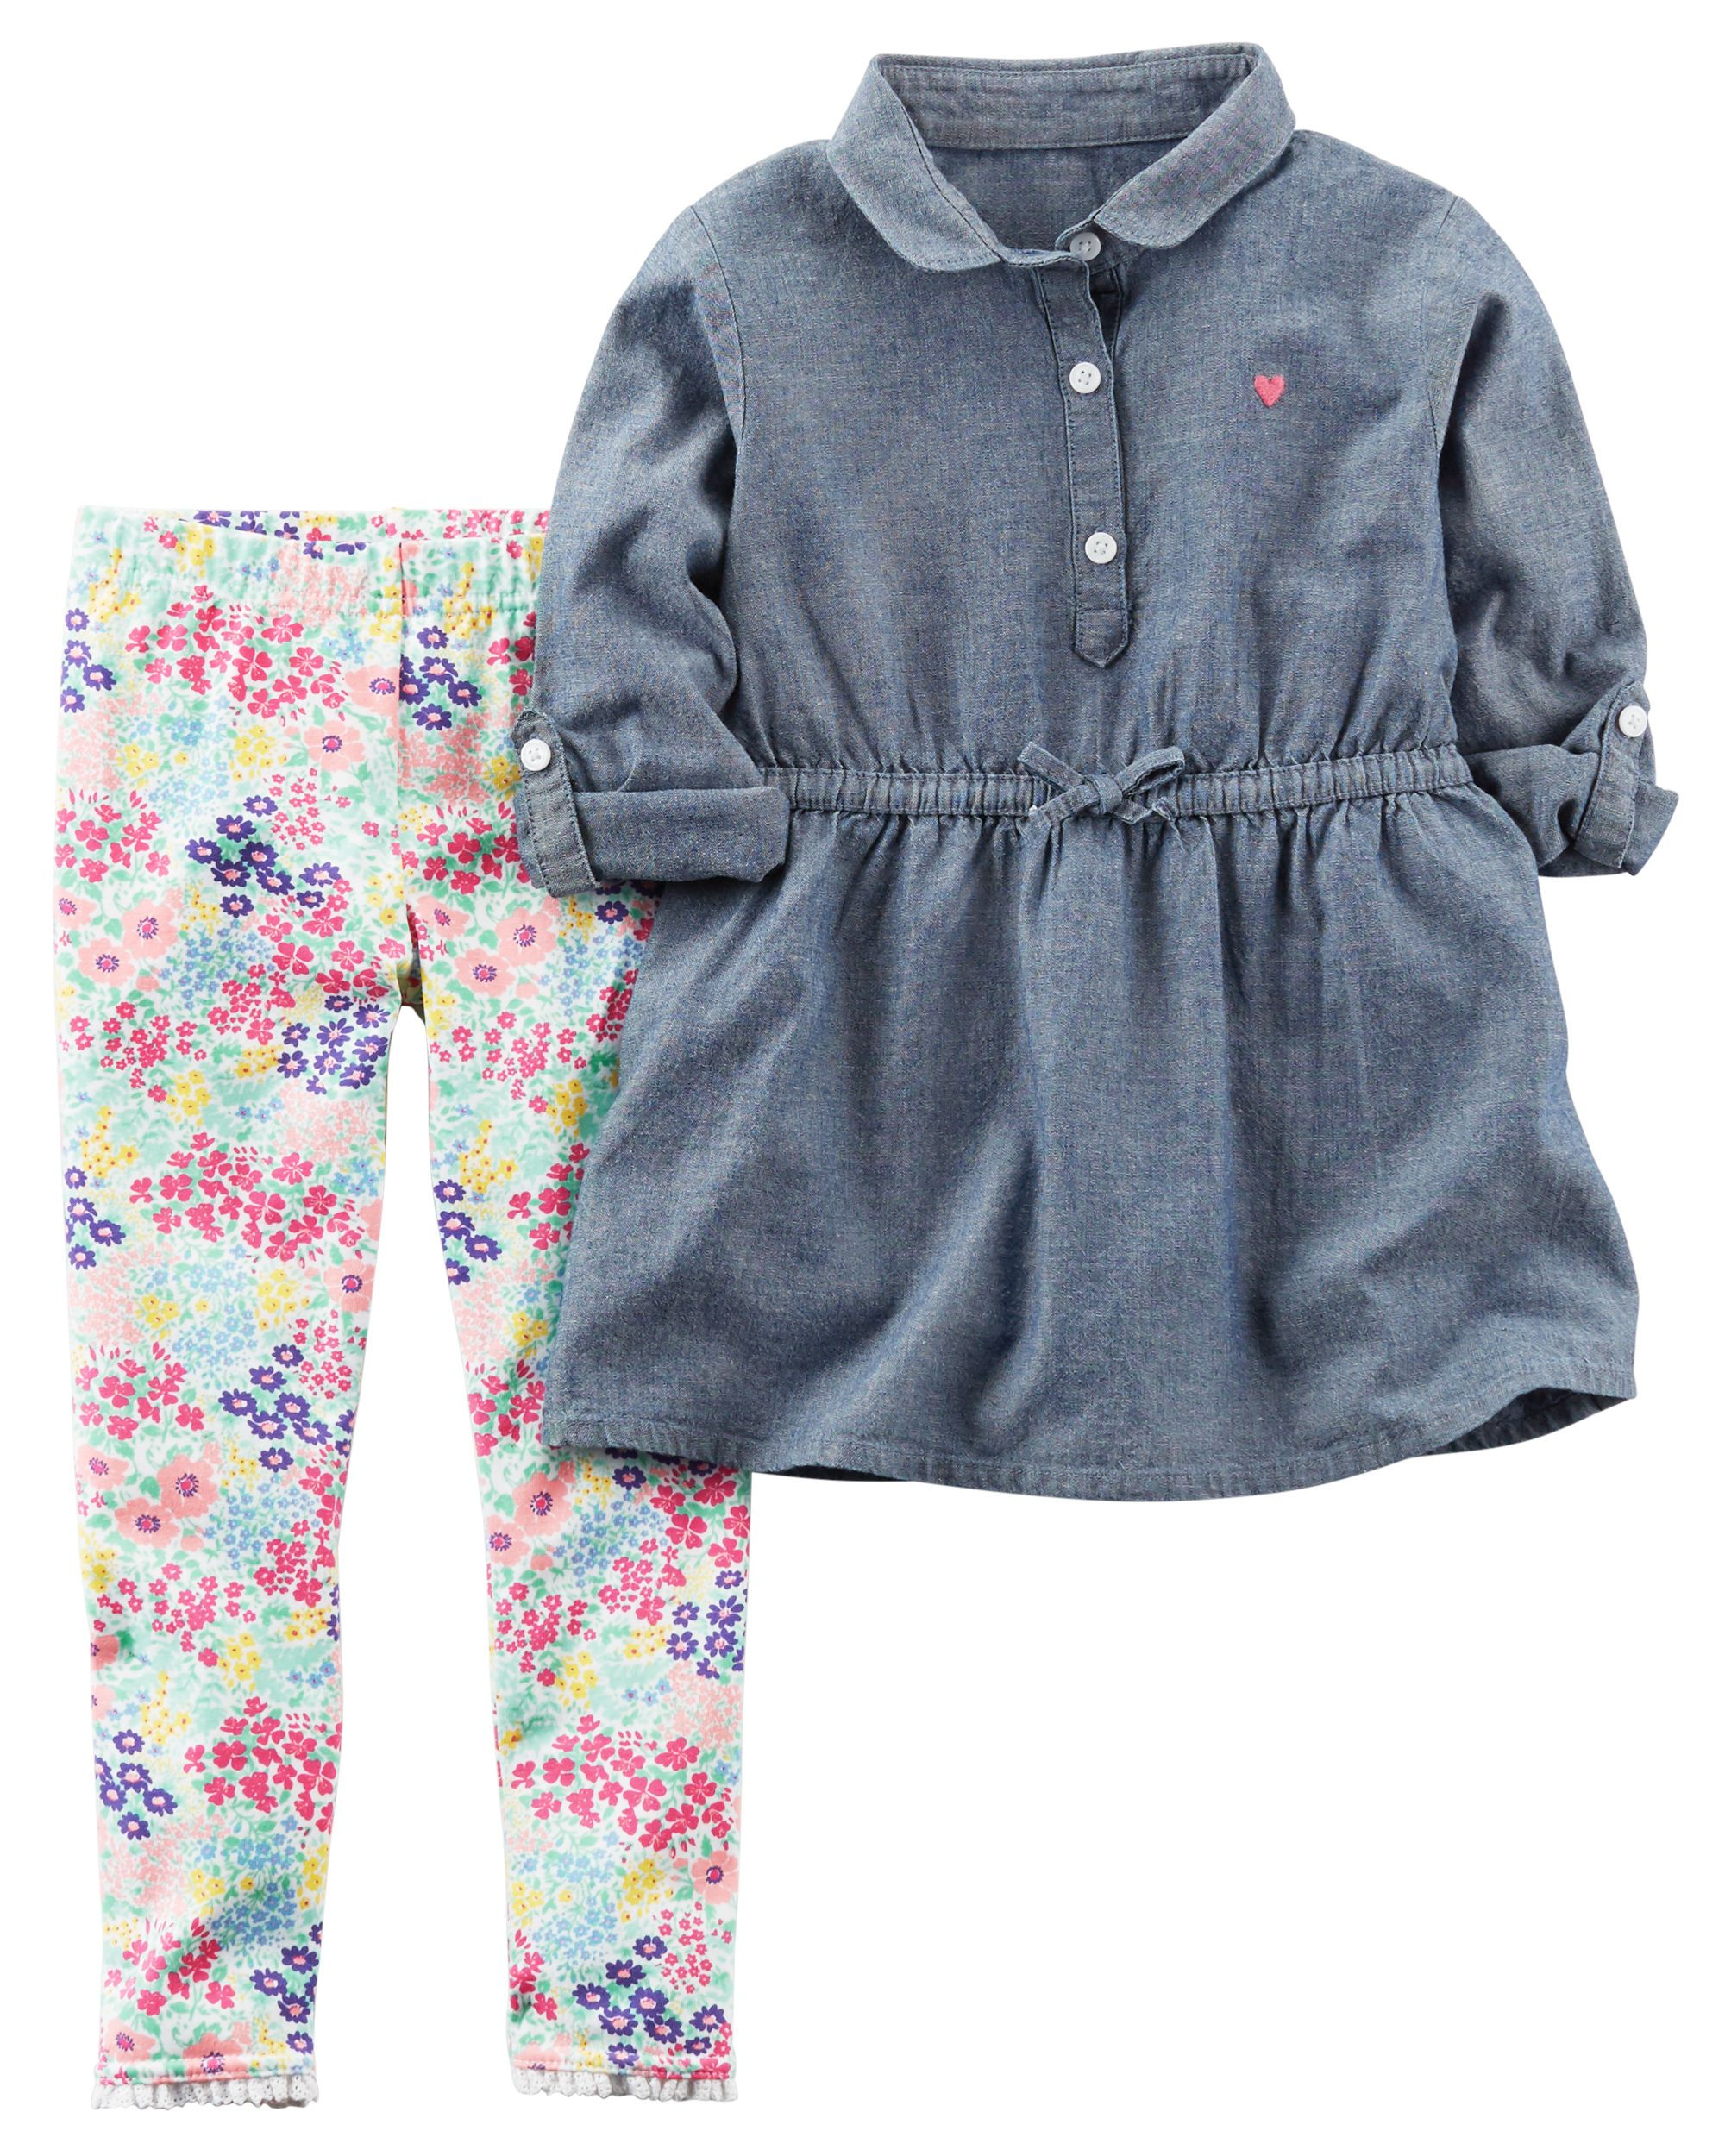 e2161447 2-Piece Chambray Tunic & Legging Set | #babygirljohnson style ...